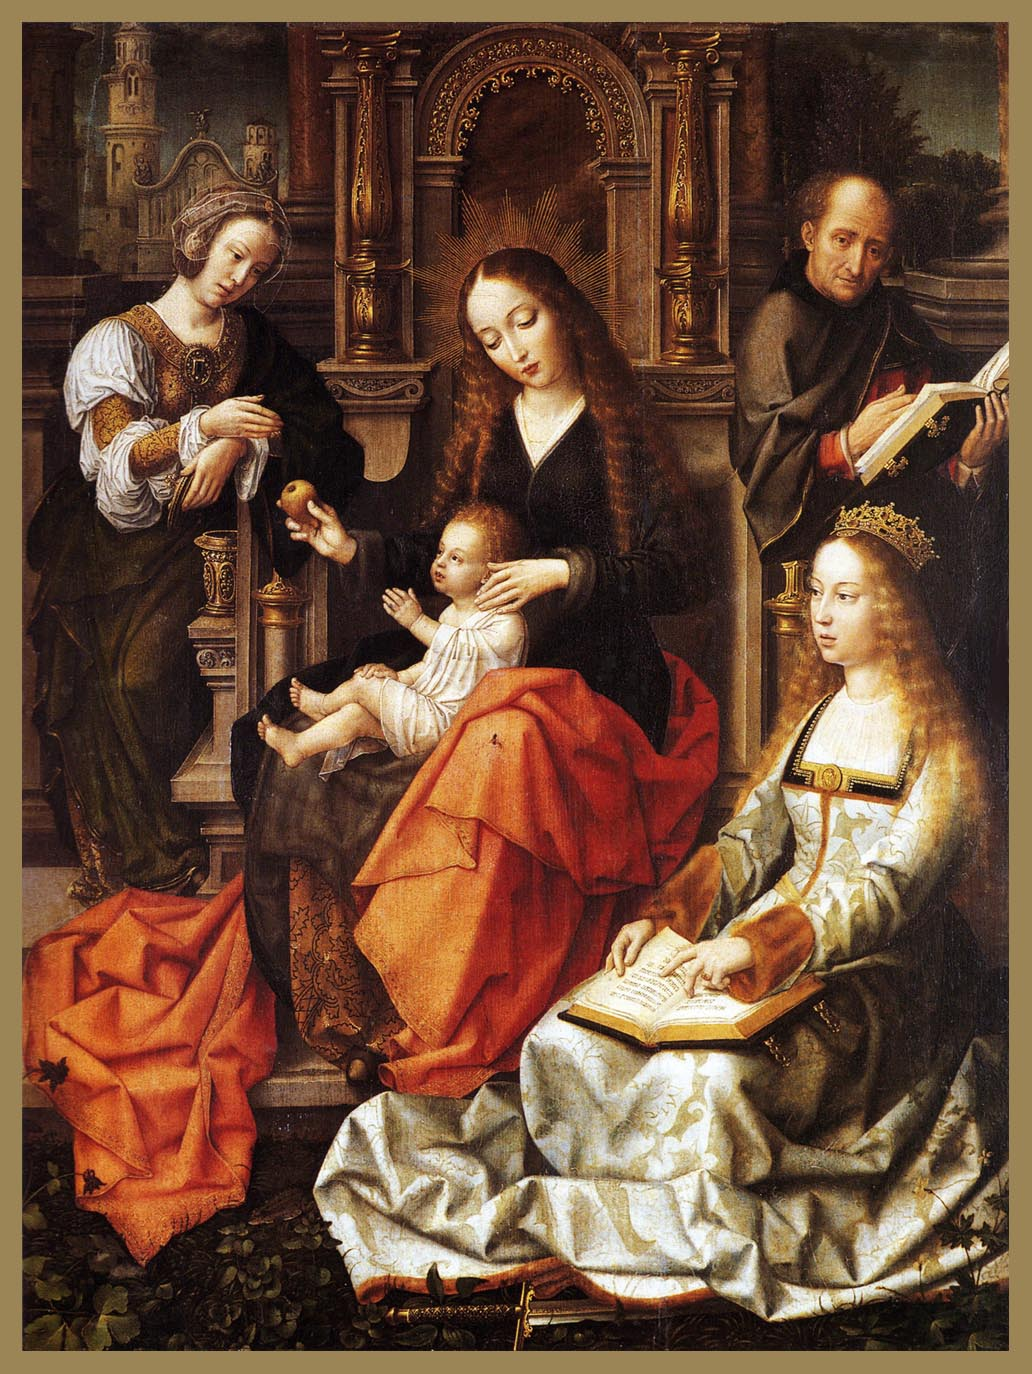 436 1 Virgen de la Mosca Colegiata de Toro